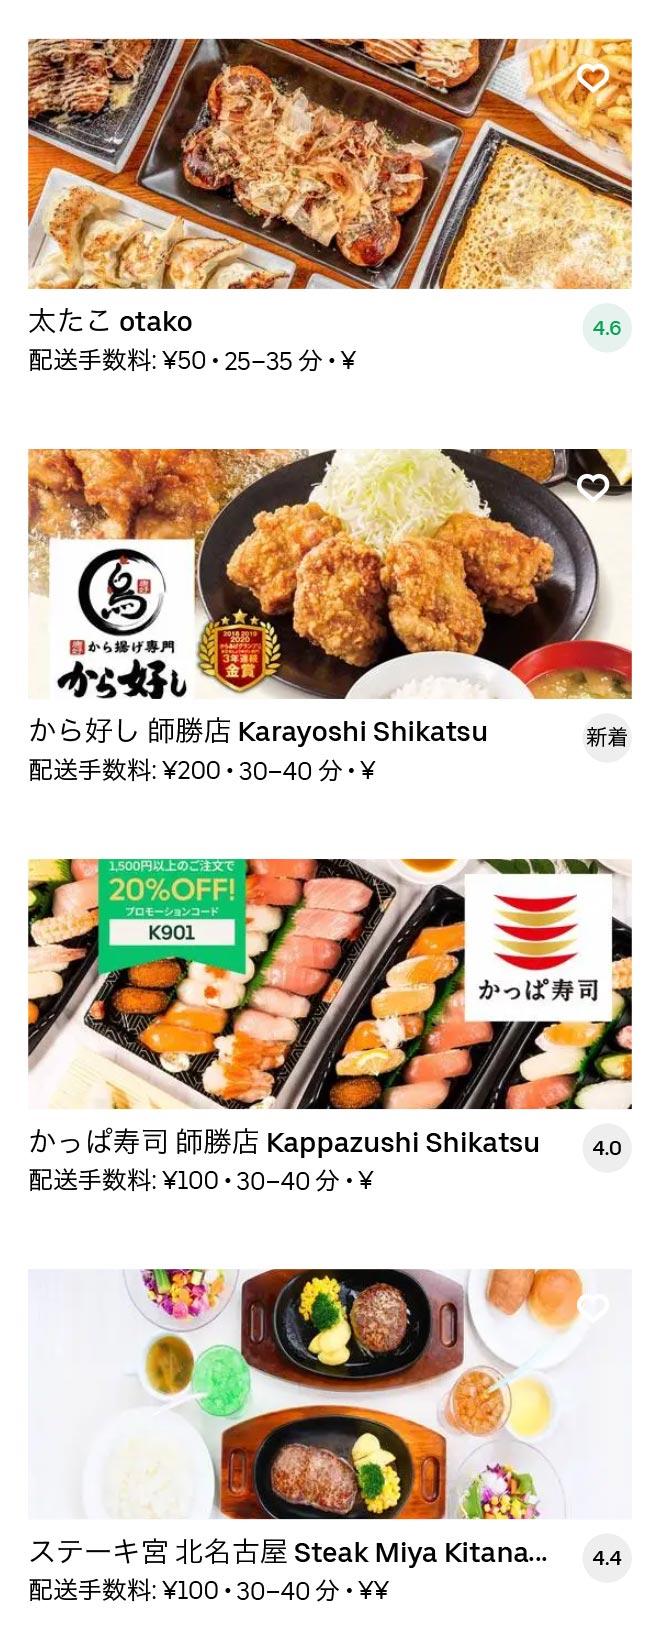 Nishiharu menu 2010 03